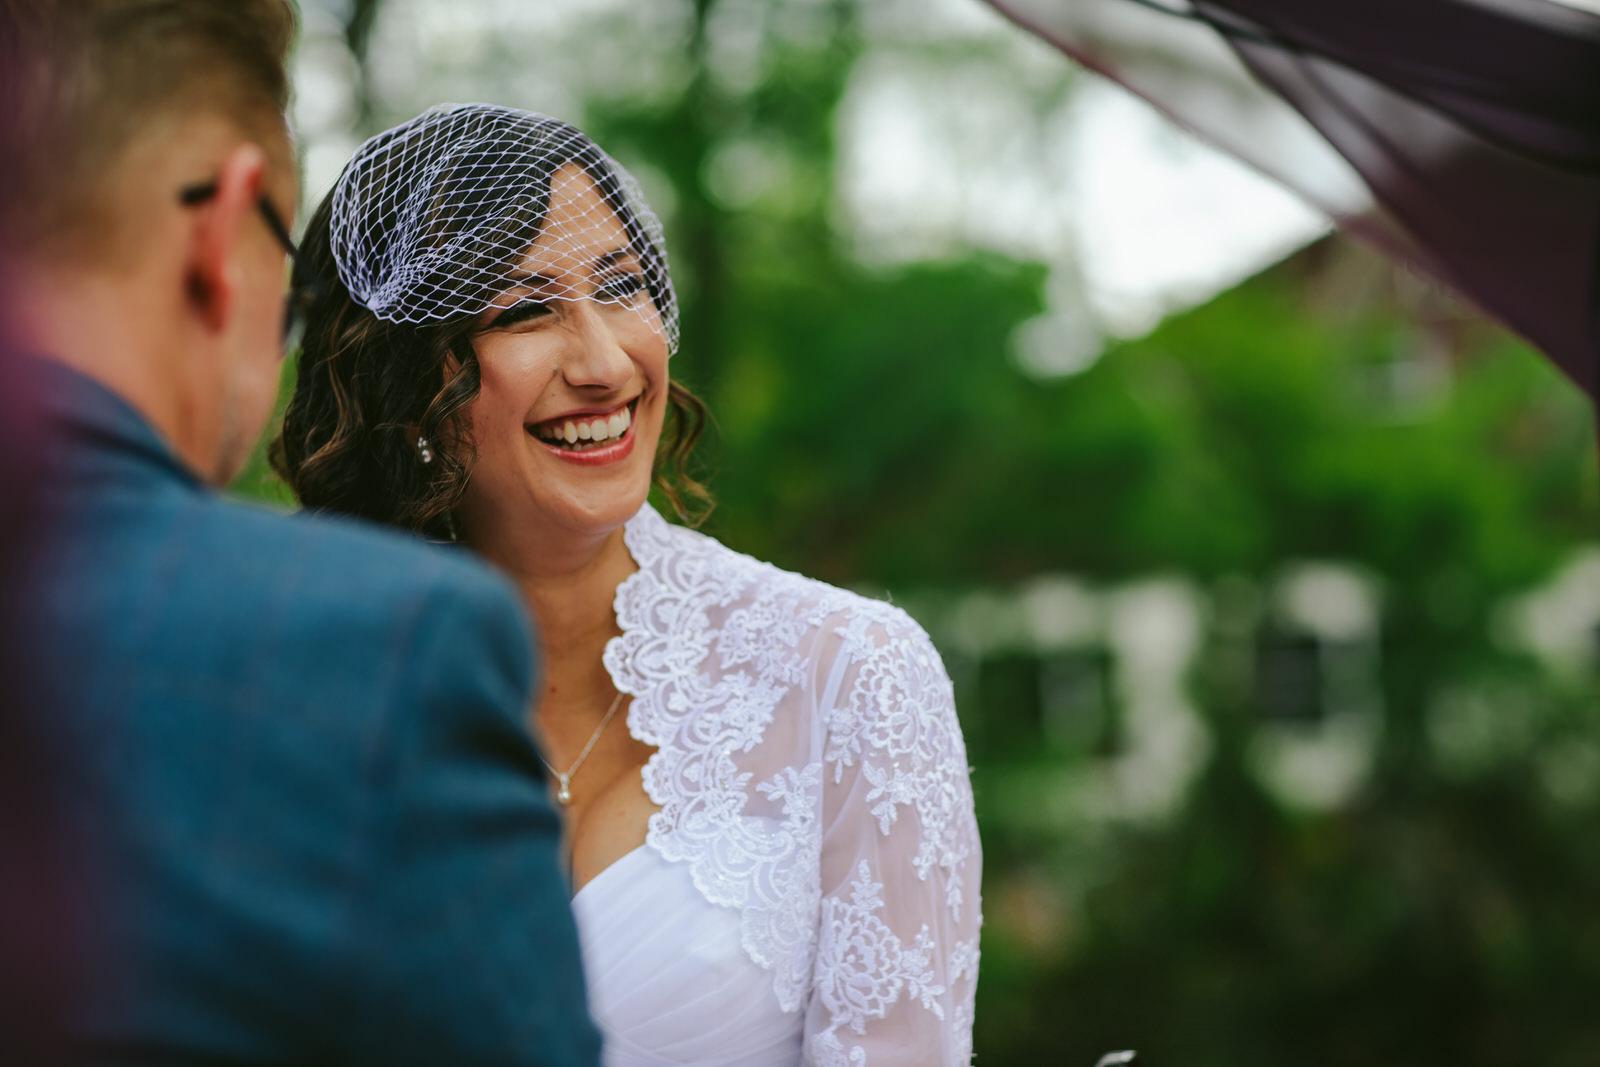 kashi-ashram-wedding-ceremony-sebastian-florida-tiny-house-photo-32.jpg